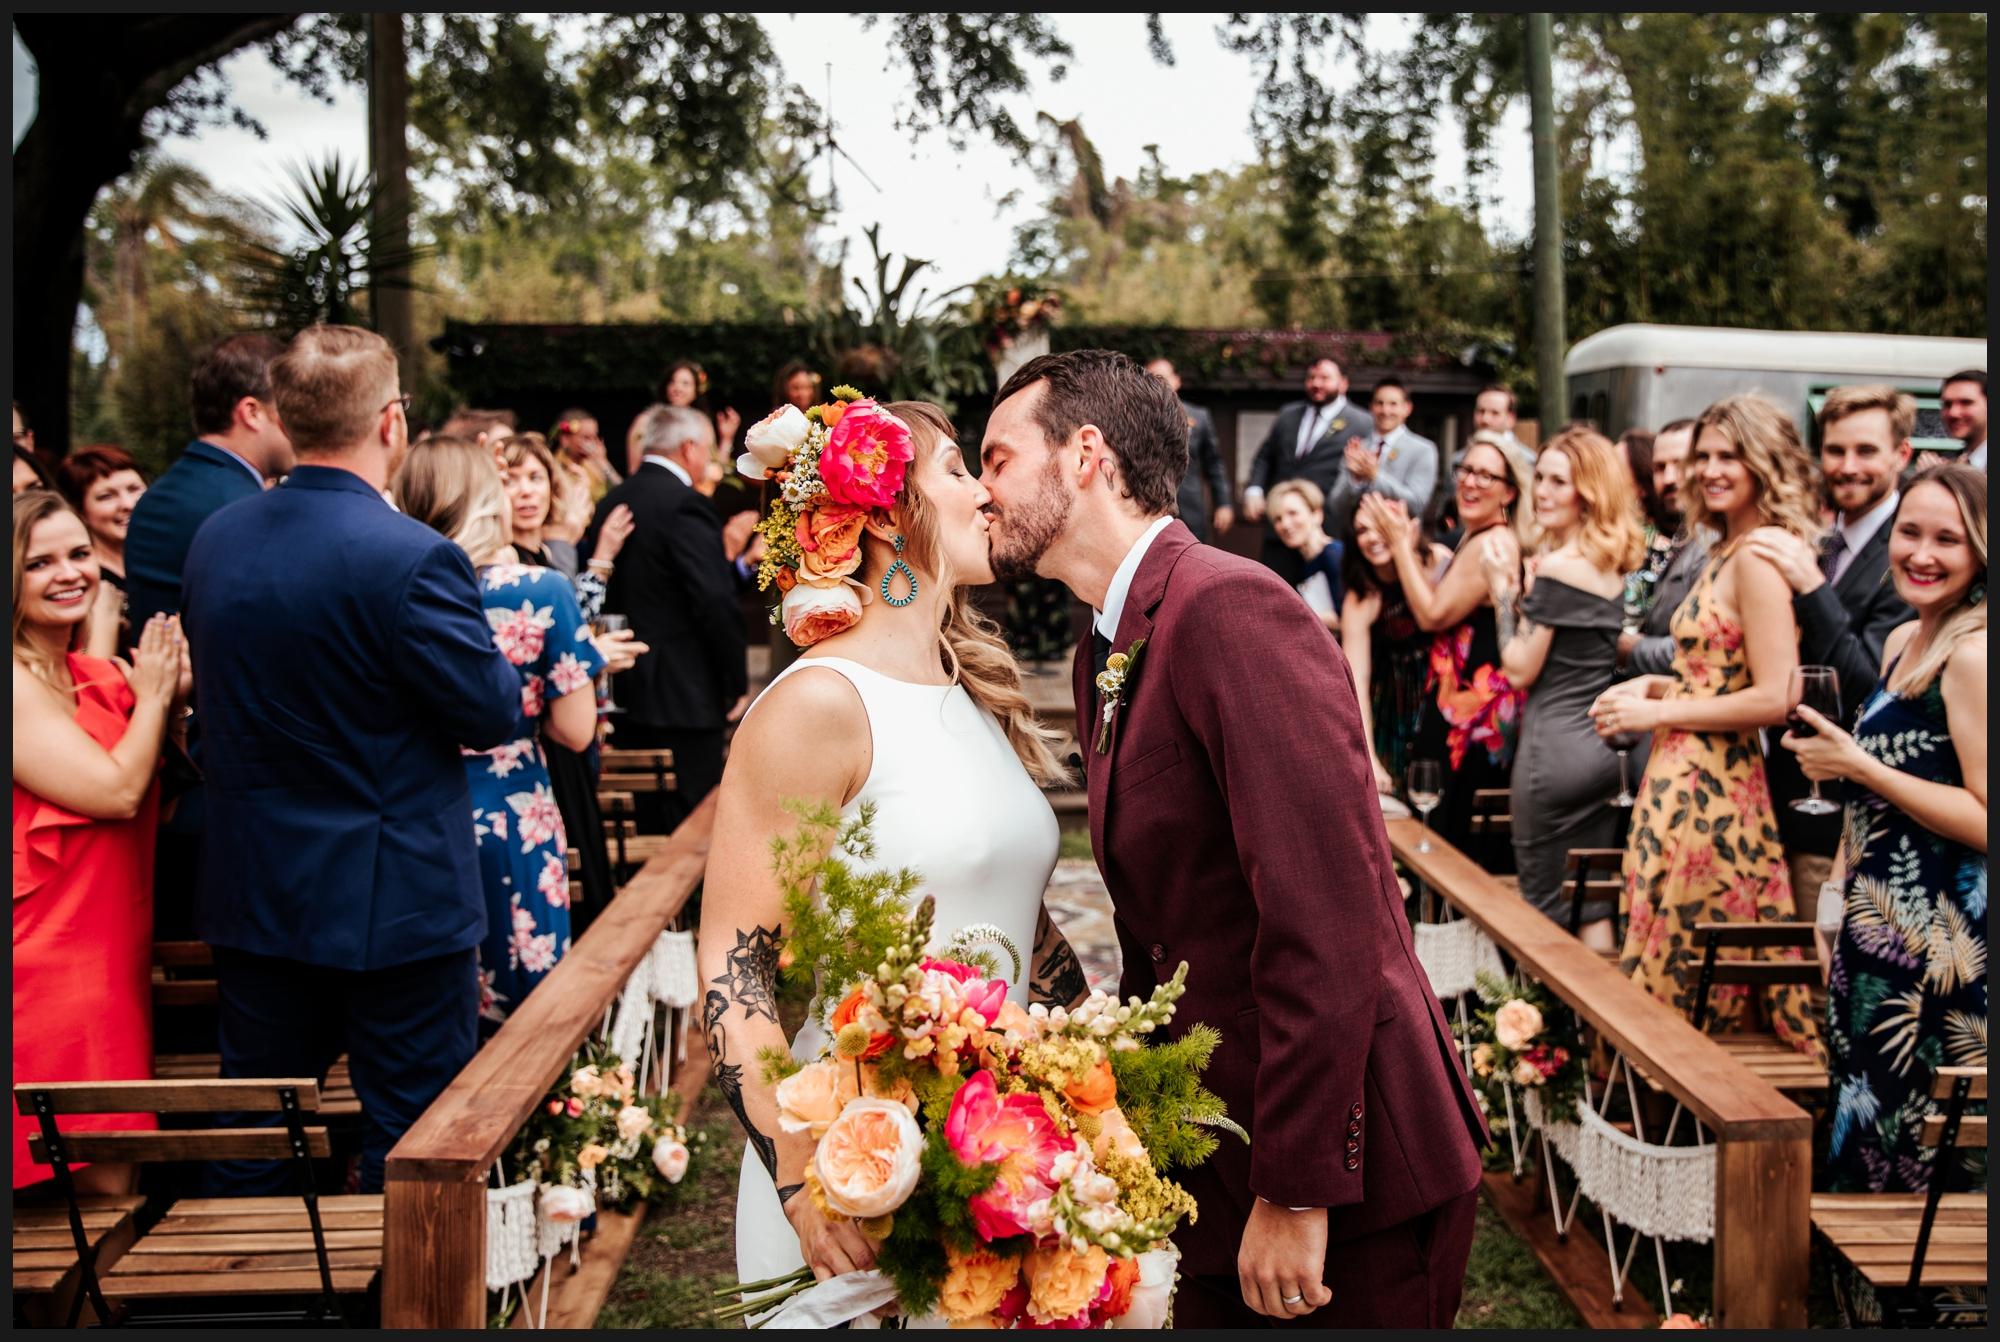 Orlando-Wedding-Photographer-destination-wedding-photographer-florida-wedding-photographer-bohemian-wedding-photographer_2013.jpg